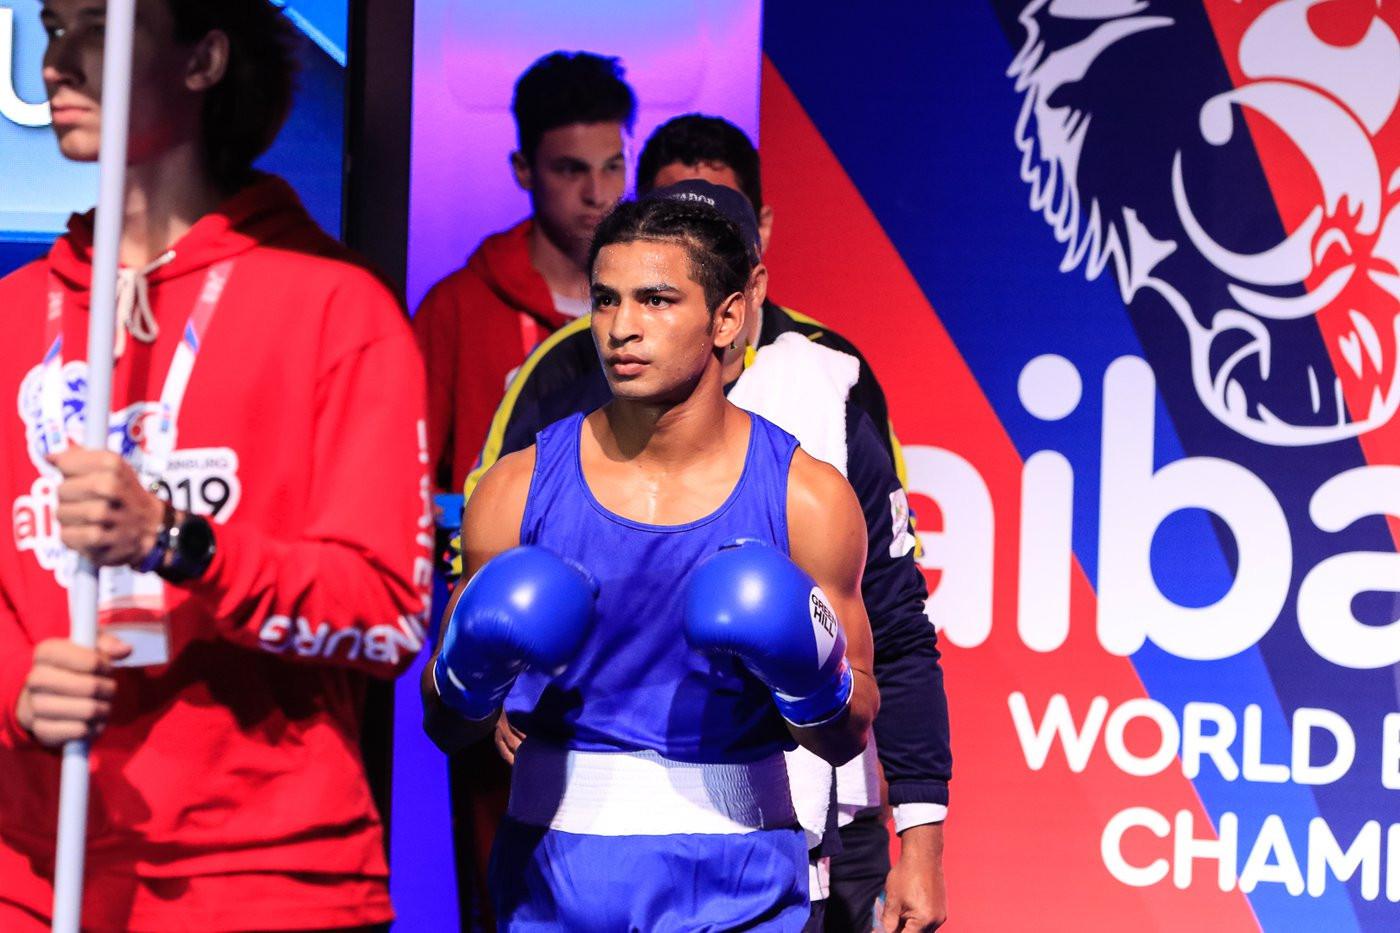 Ecuador's Jean Caicedo met Oleksii Kozolok of Ukraine in the opening fight ©Yekaterinburg 2019